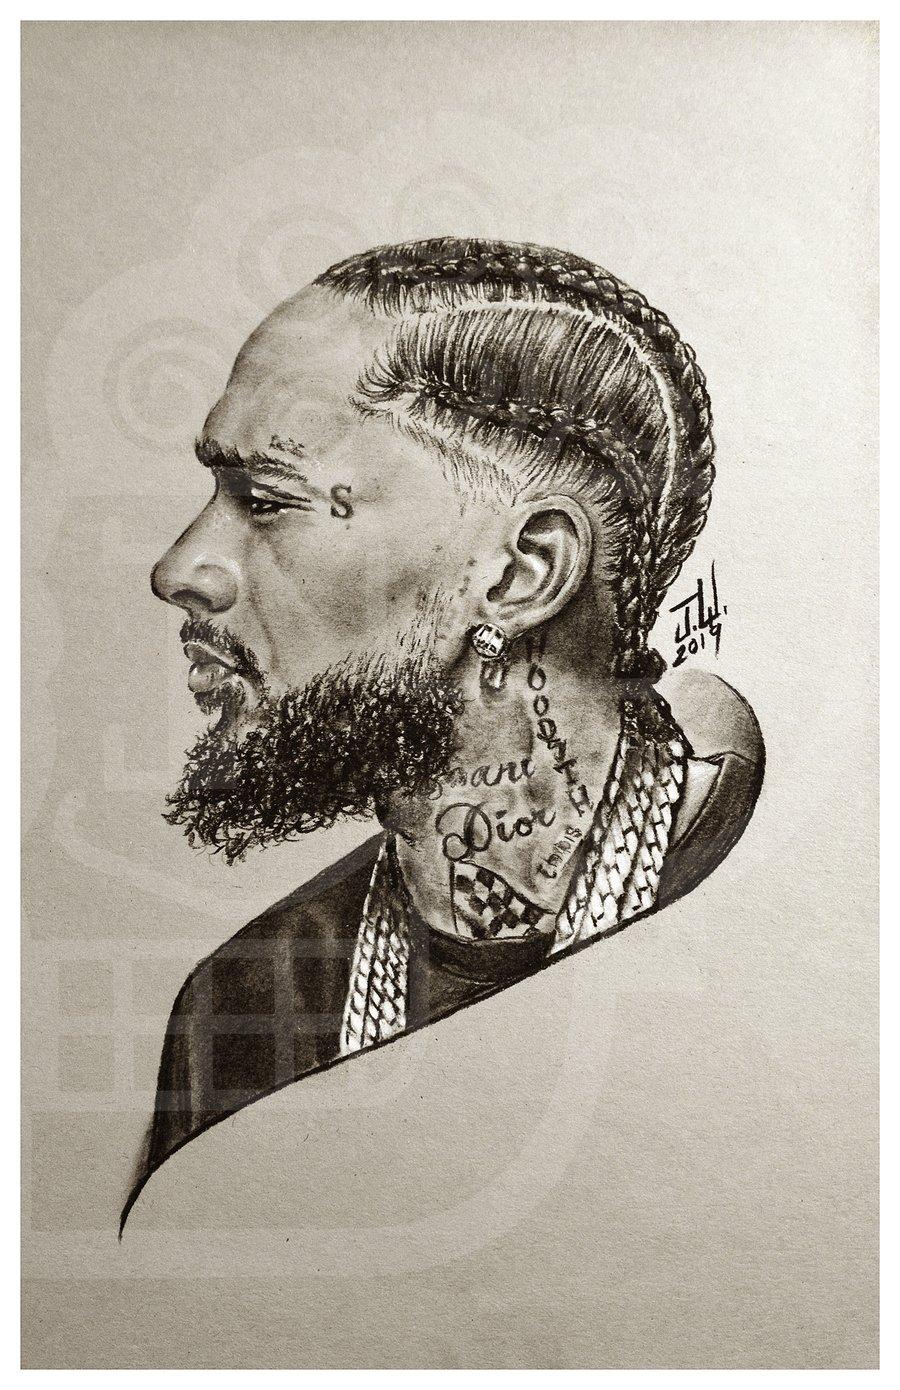 Image of Nipsey Hussle Ermias Asghedom entrepreneur legend hip hop rapper